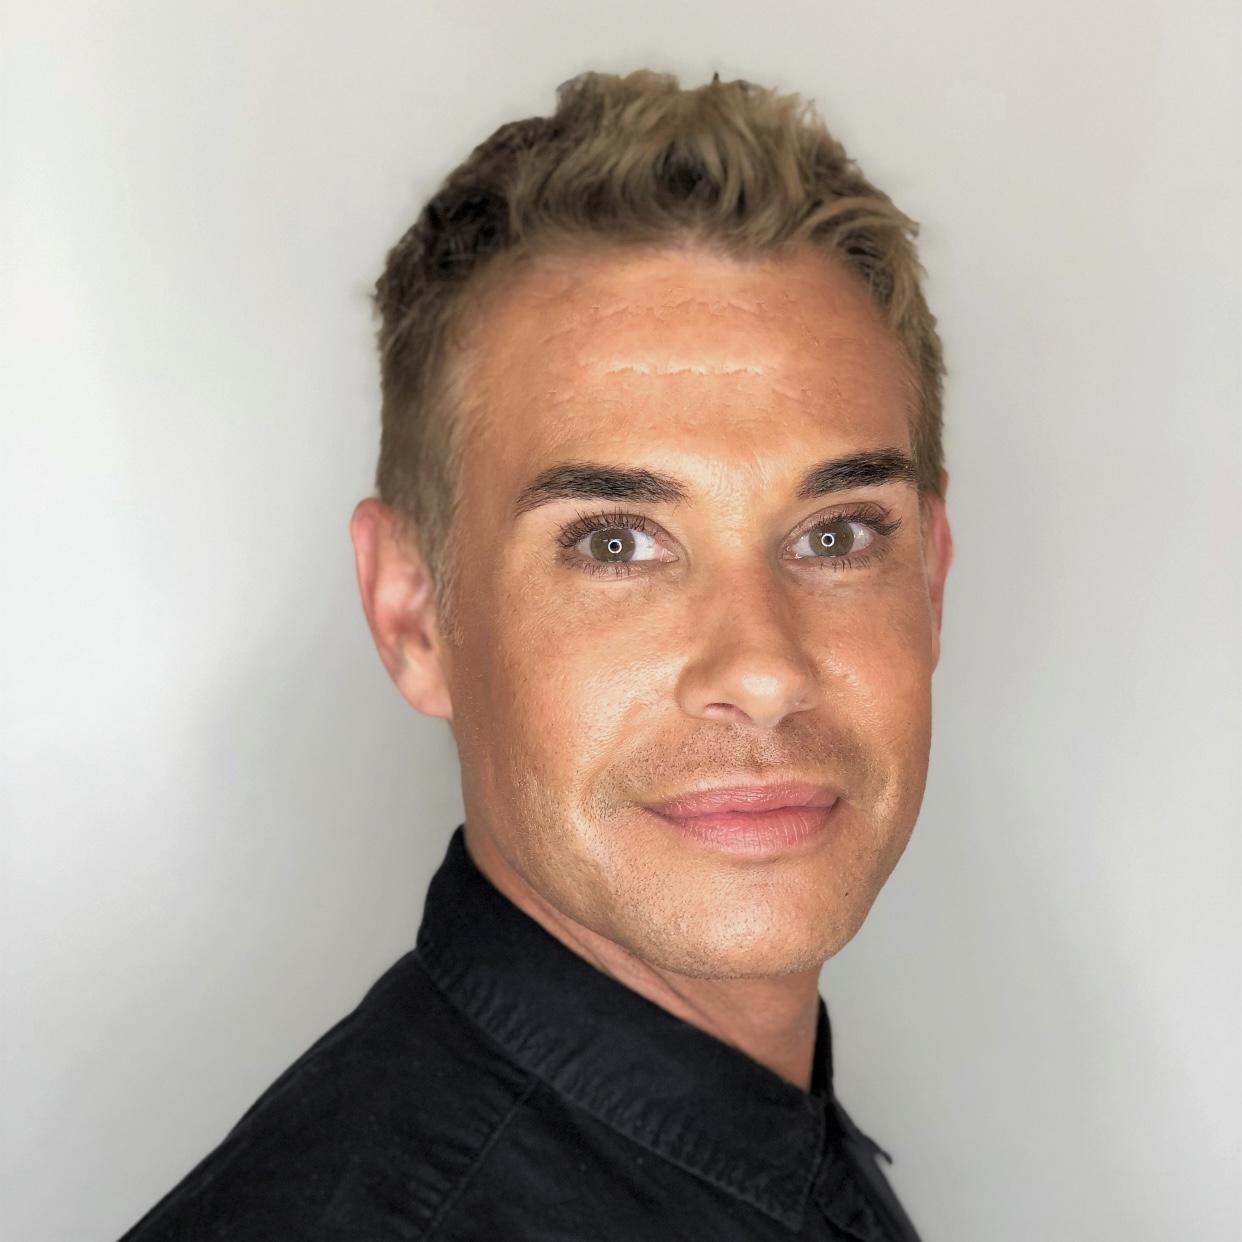 Palm Springs hair stylist